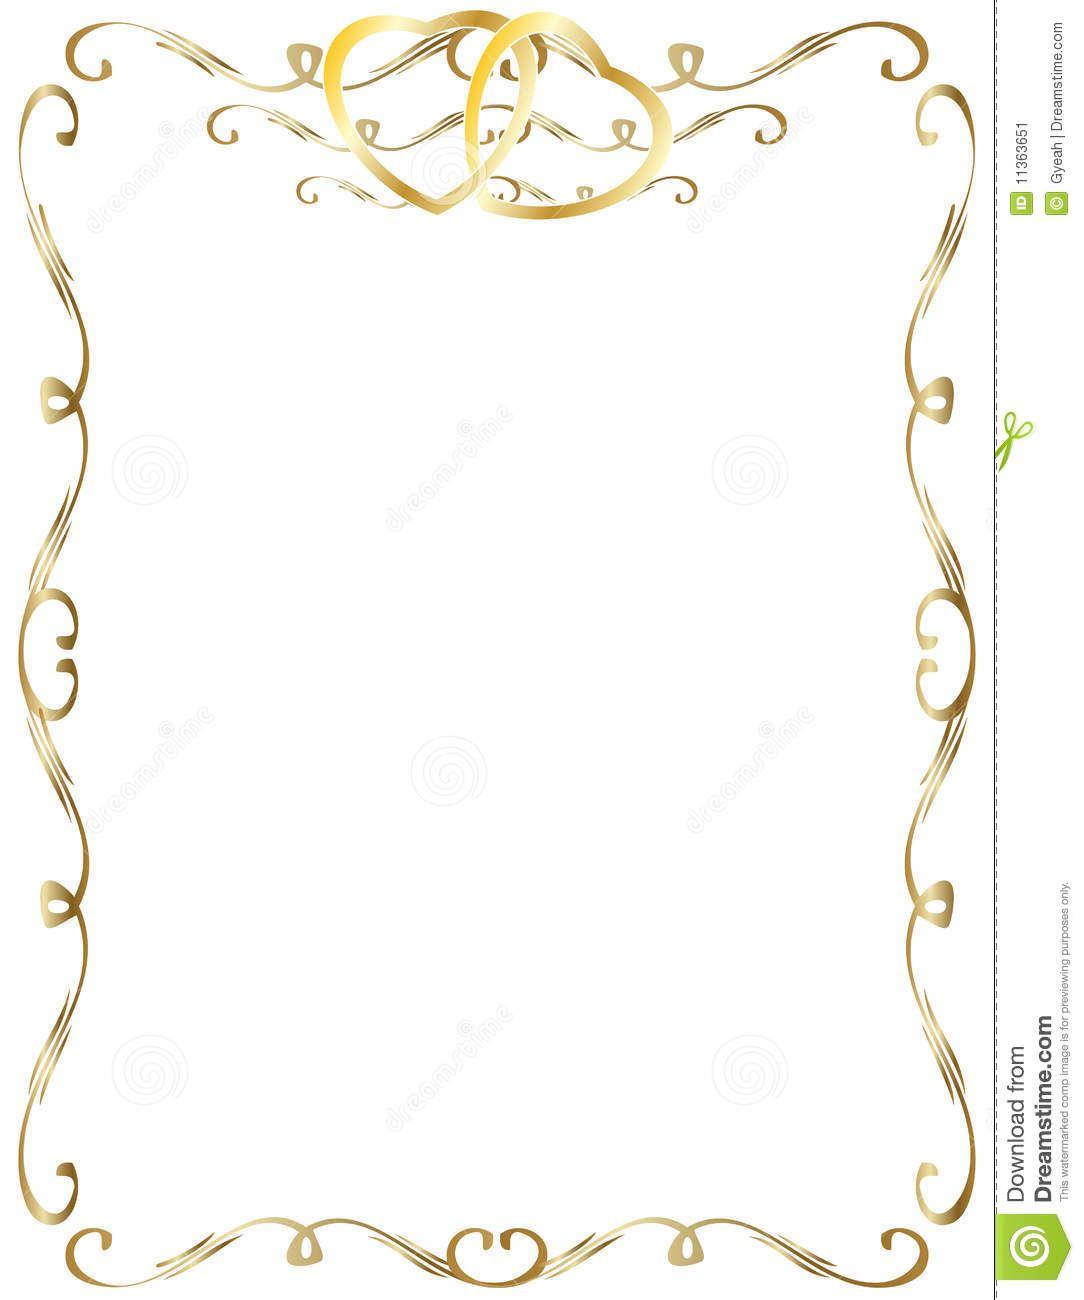 Wedding Invitation Borders Clip Art: 50th+Wedding+Anniversary+Clip+Art+Borders